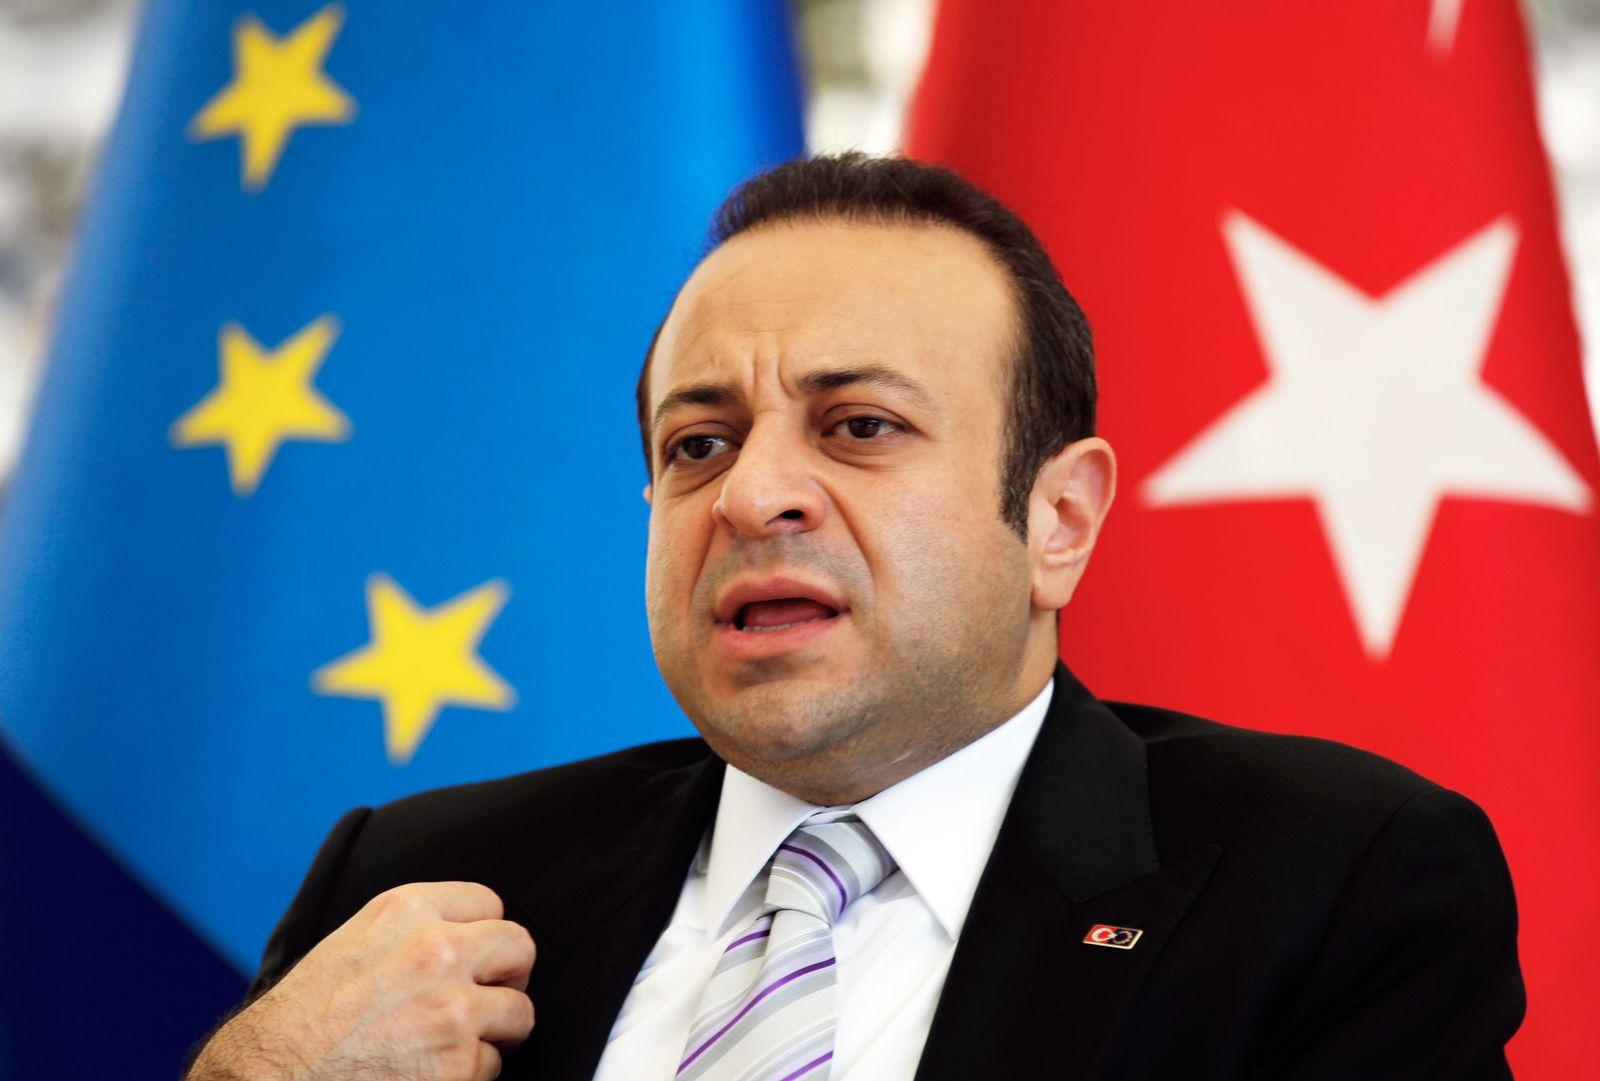 Turkeys EU Affairs Minister Egemen Bagis